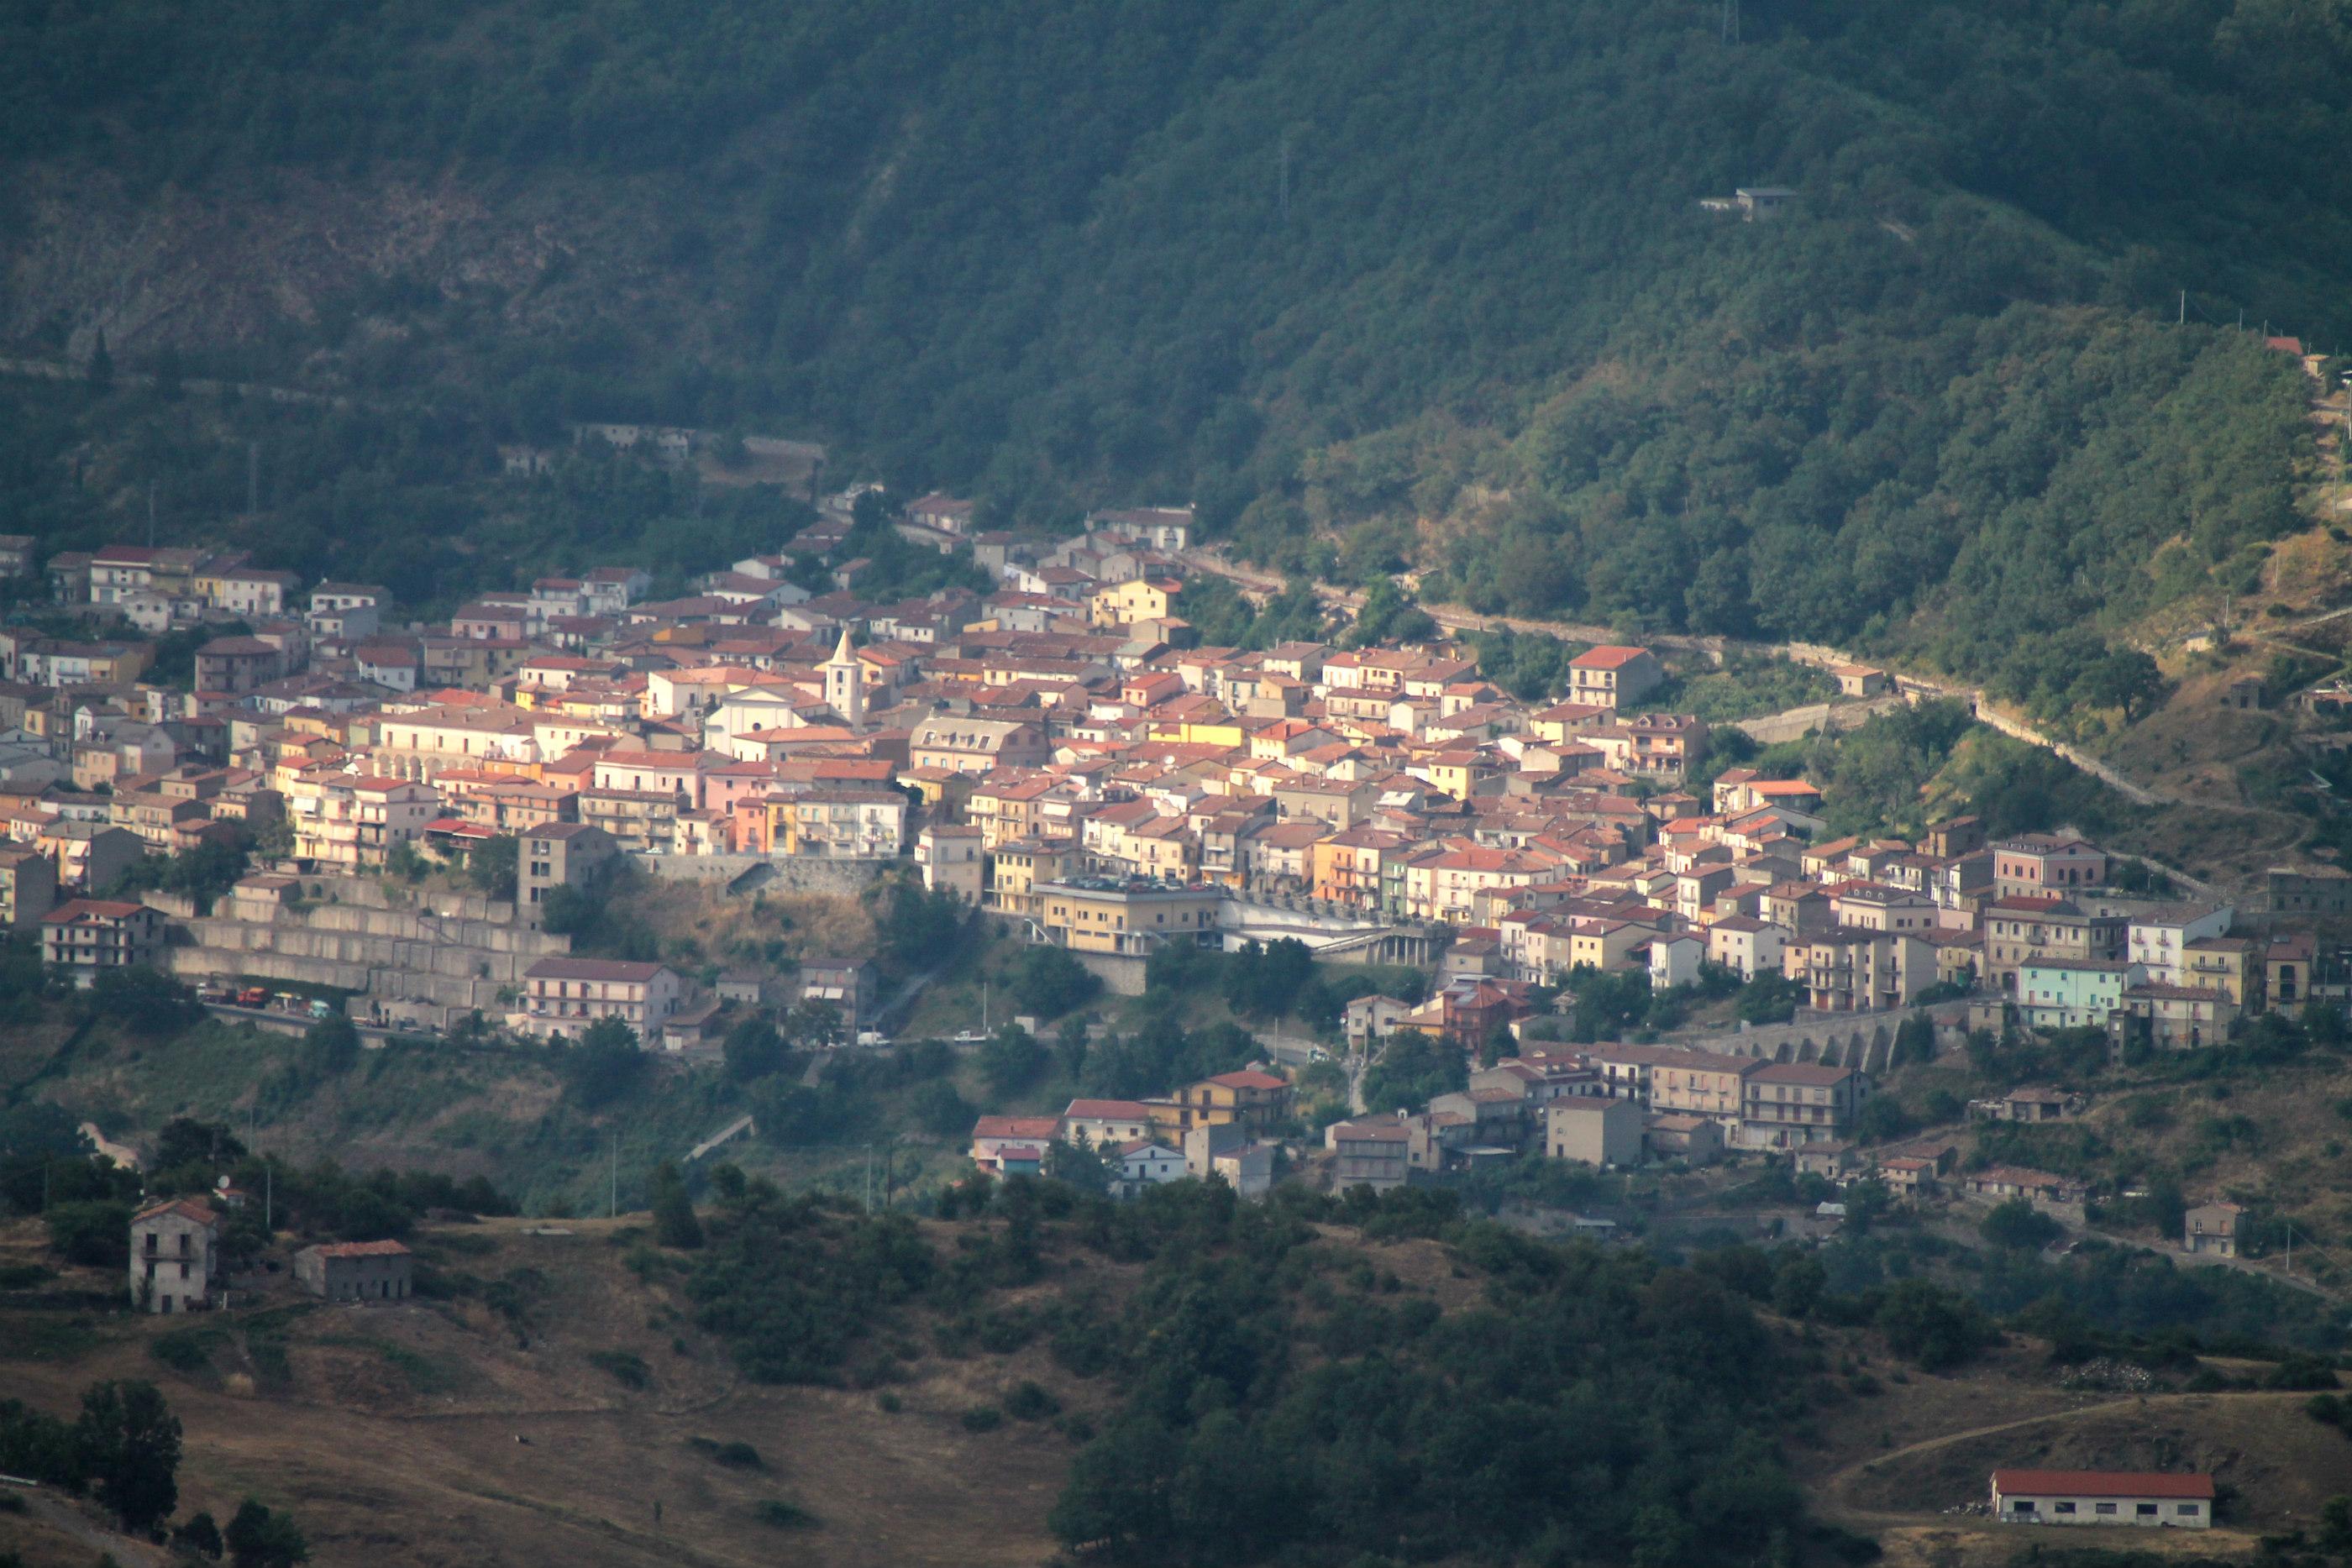 https://upload.wikimedia.org/wikipedia/commons/6/67/Terranova_di_pollino.jpg